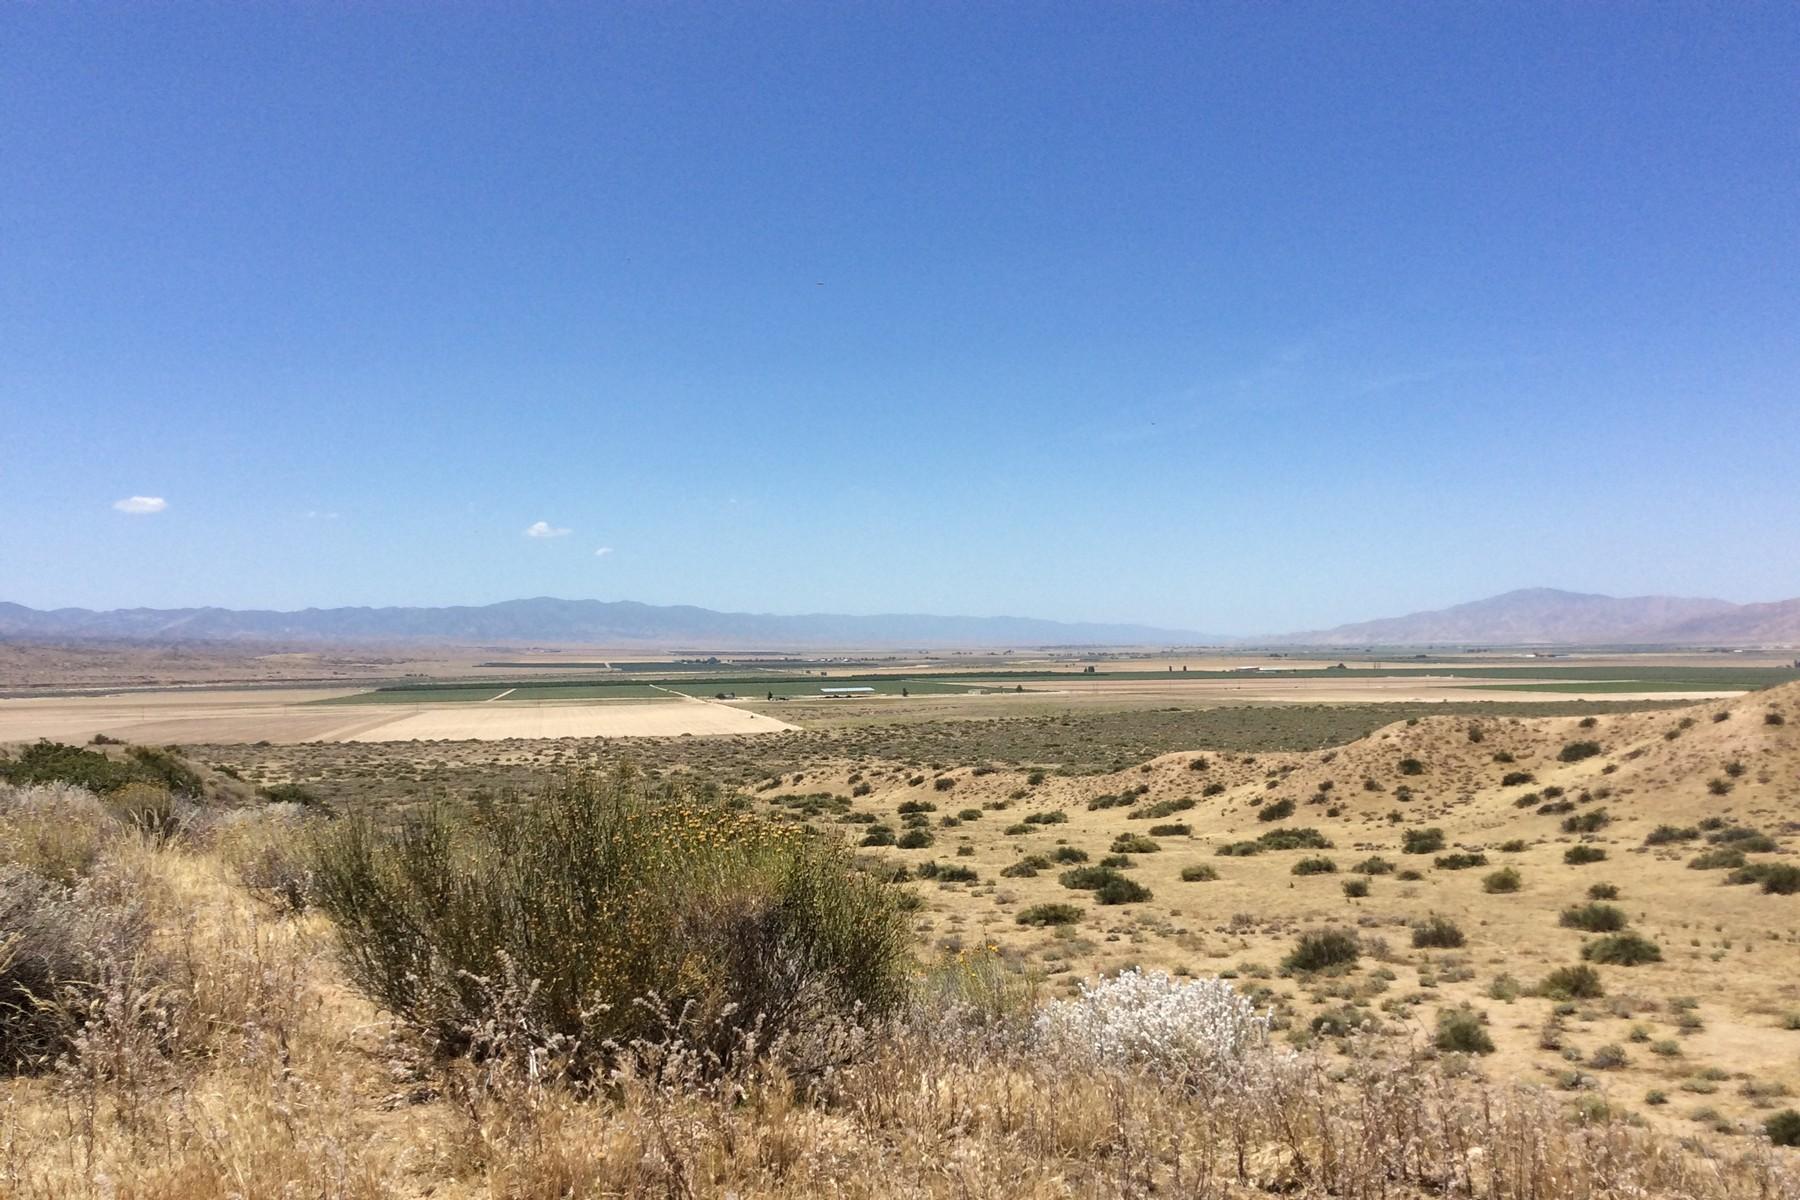 Terreno para Venda às 0 APN 149-180-029 New Cuyama, CA 93254 New Cuyama, Califórnia 93254 Estados Unidos